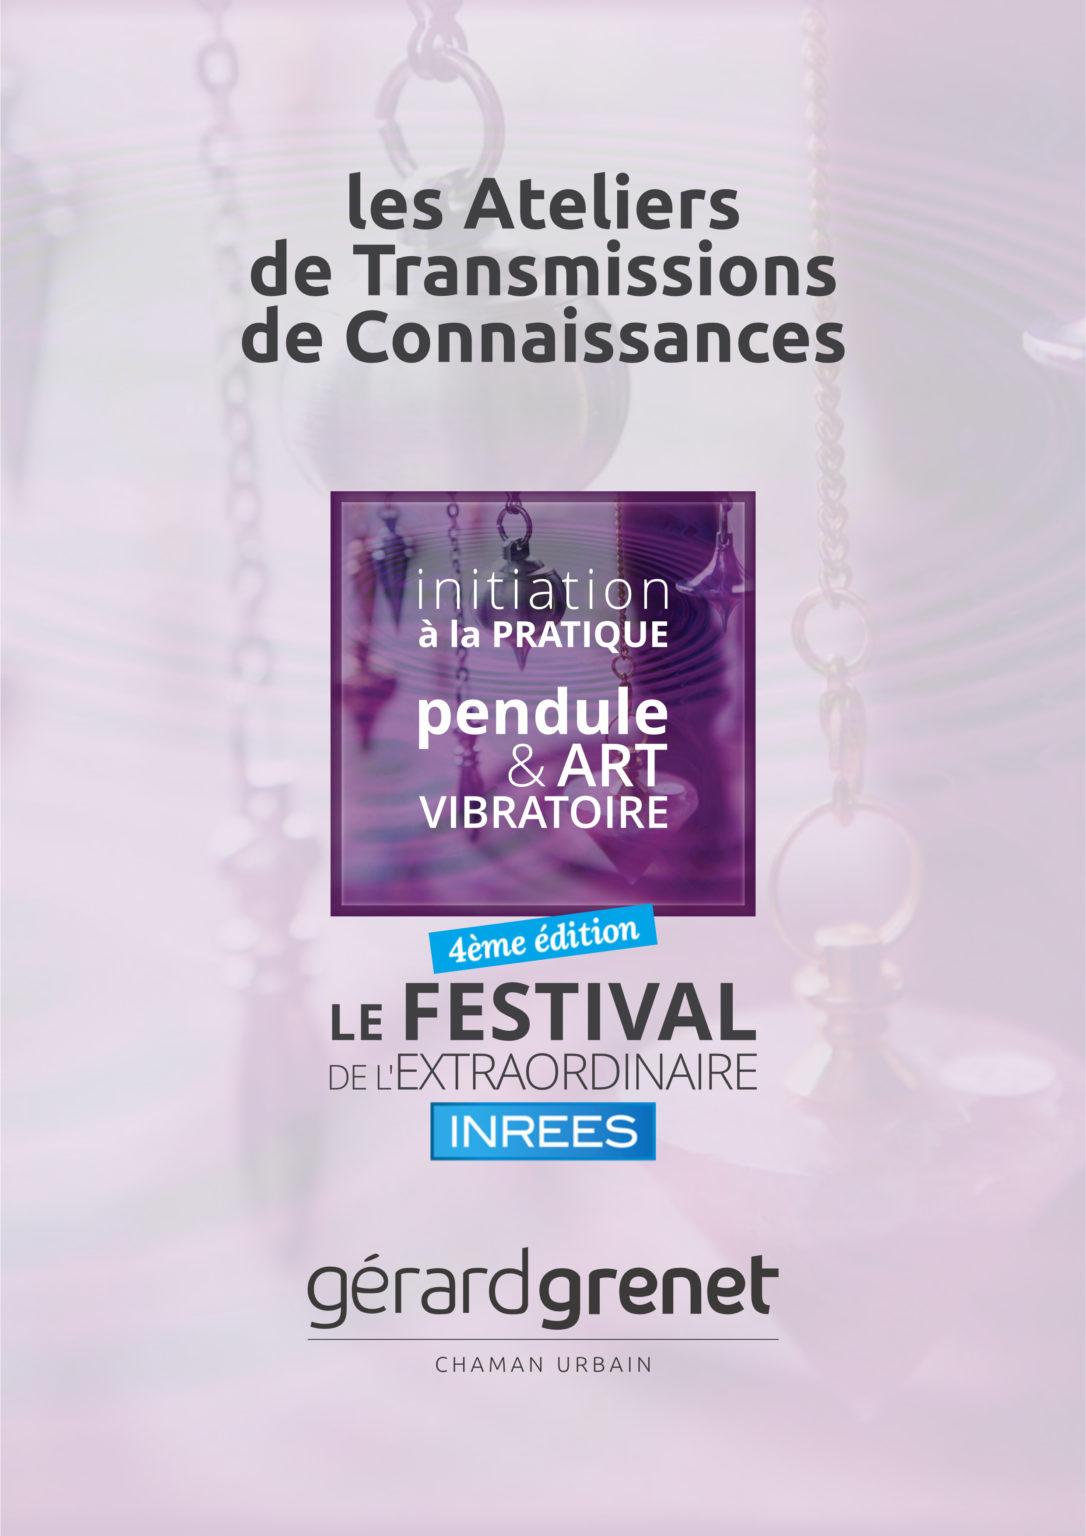 4eme festival de l'extraordinaire avec l'INREES